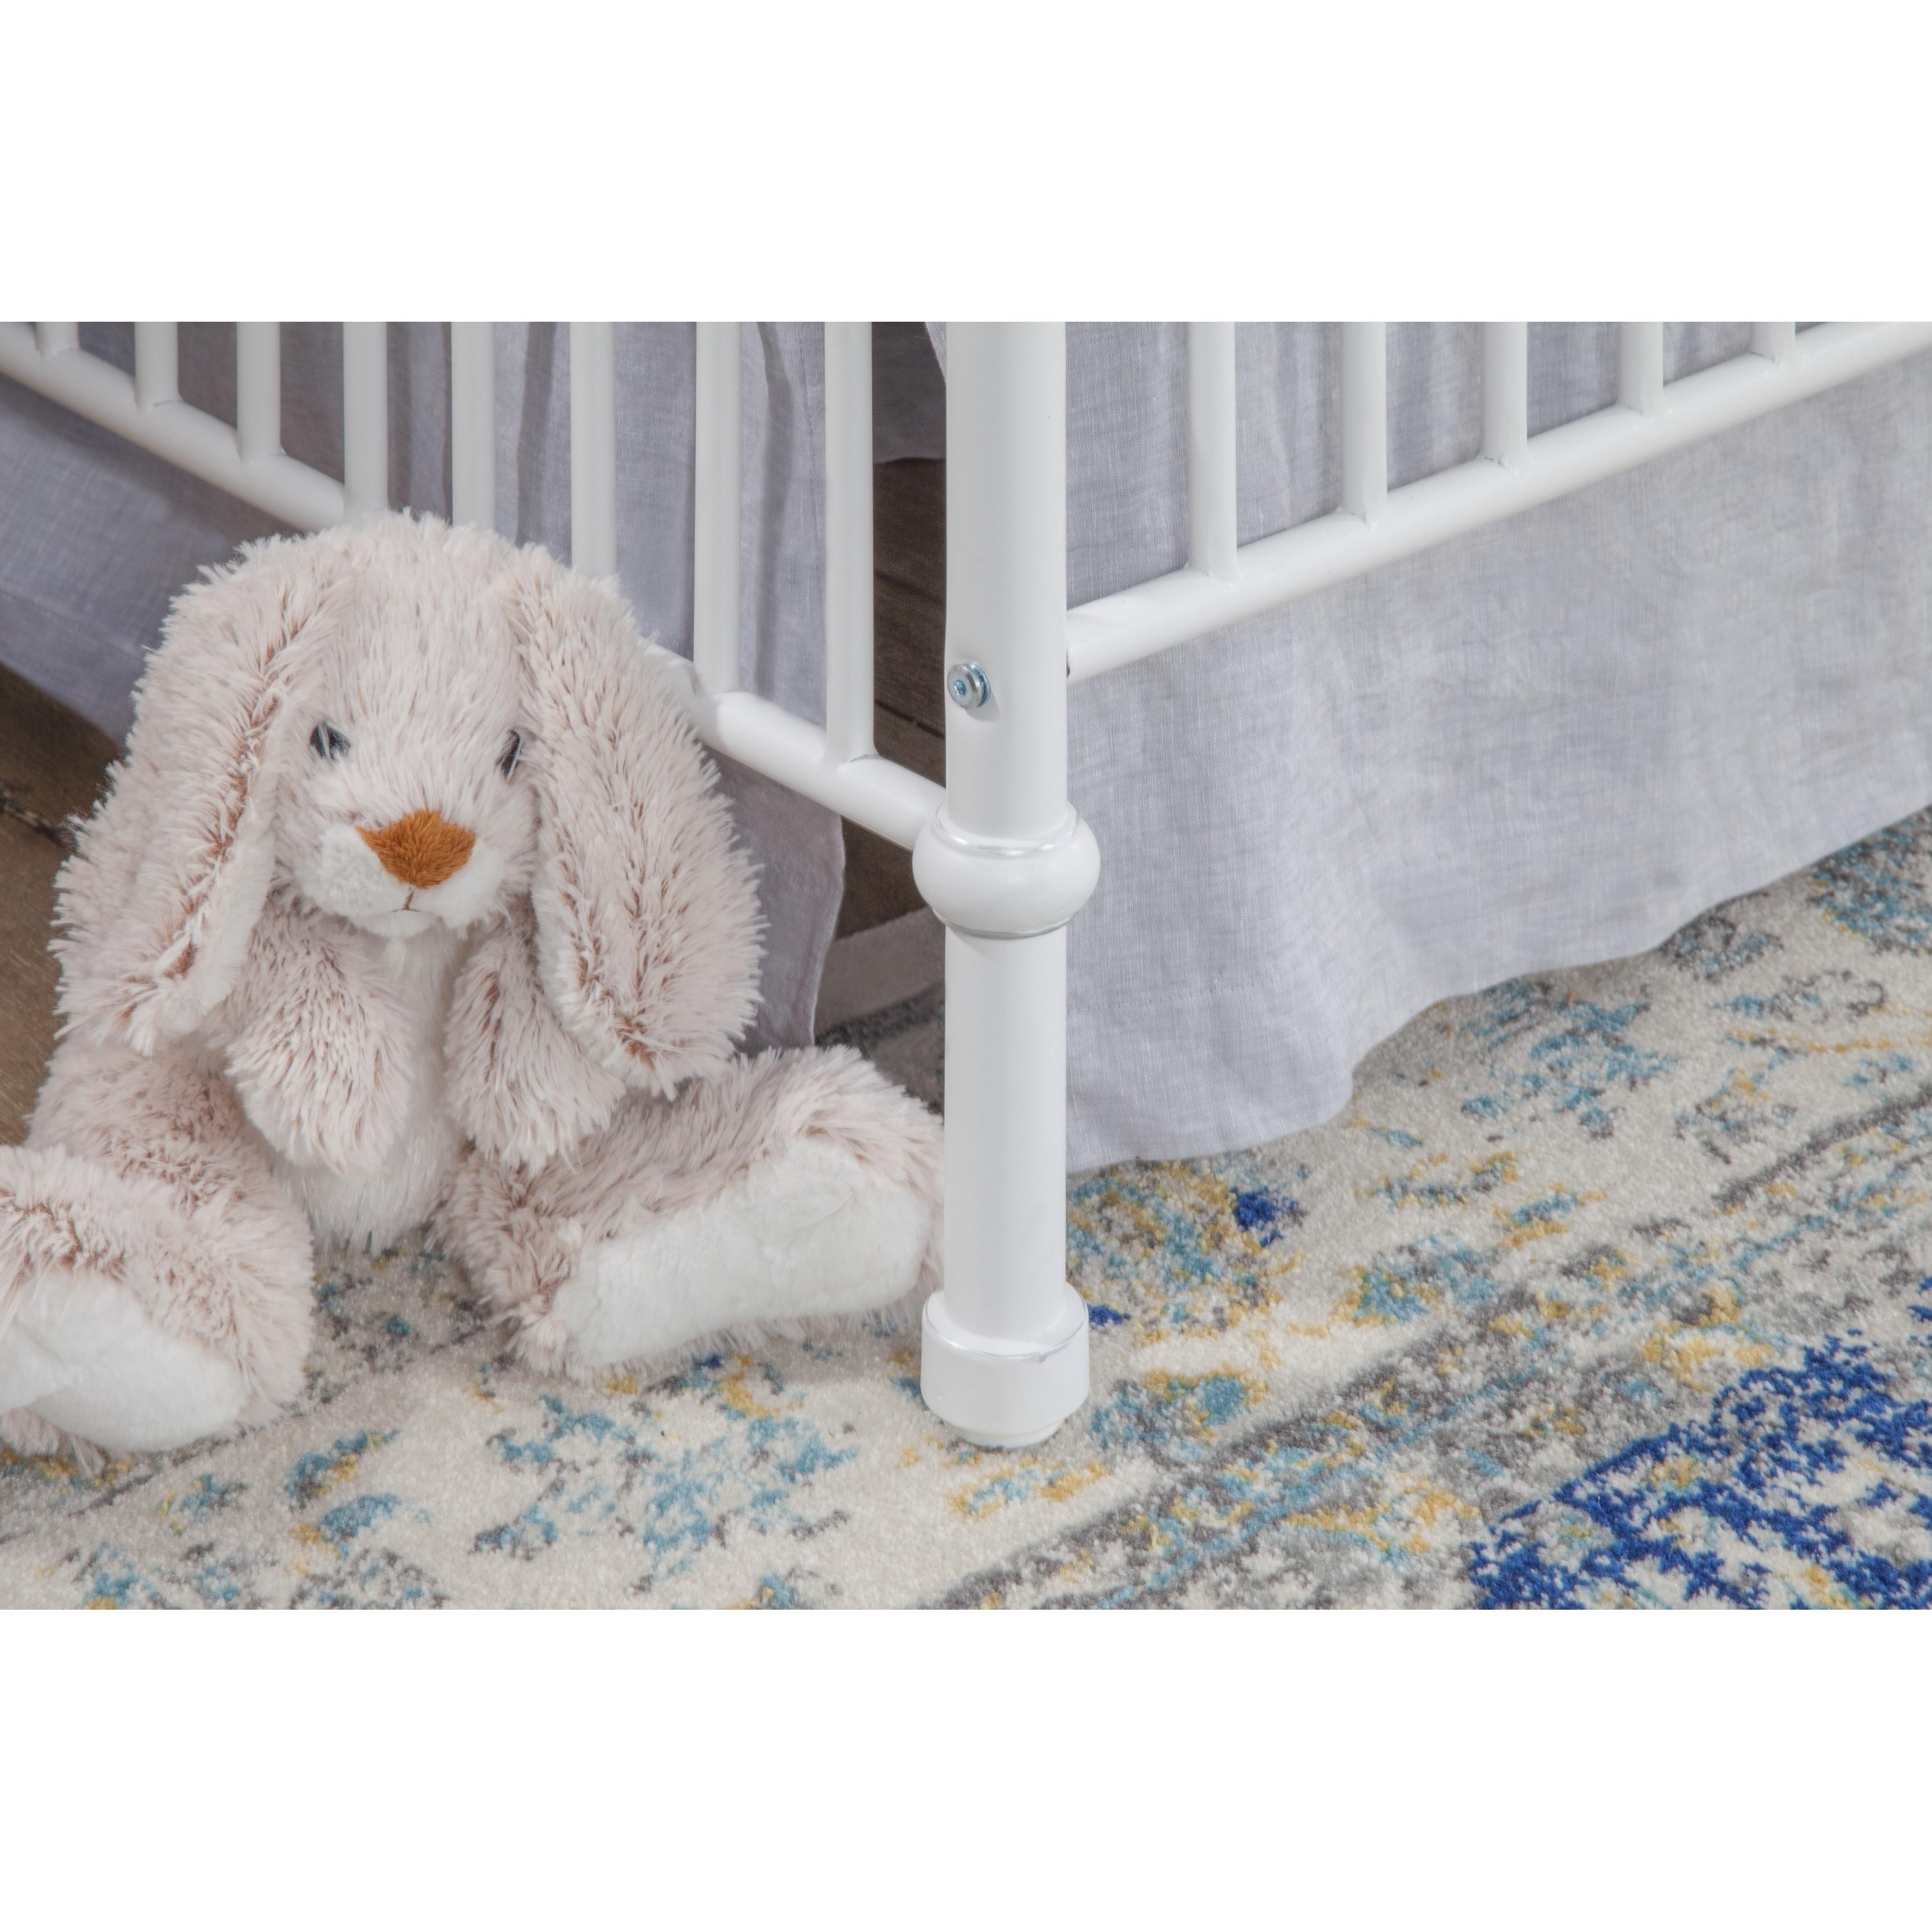 main lind baby jenny fairway cribs lifestyle davinci convertible in crib